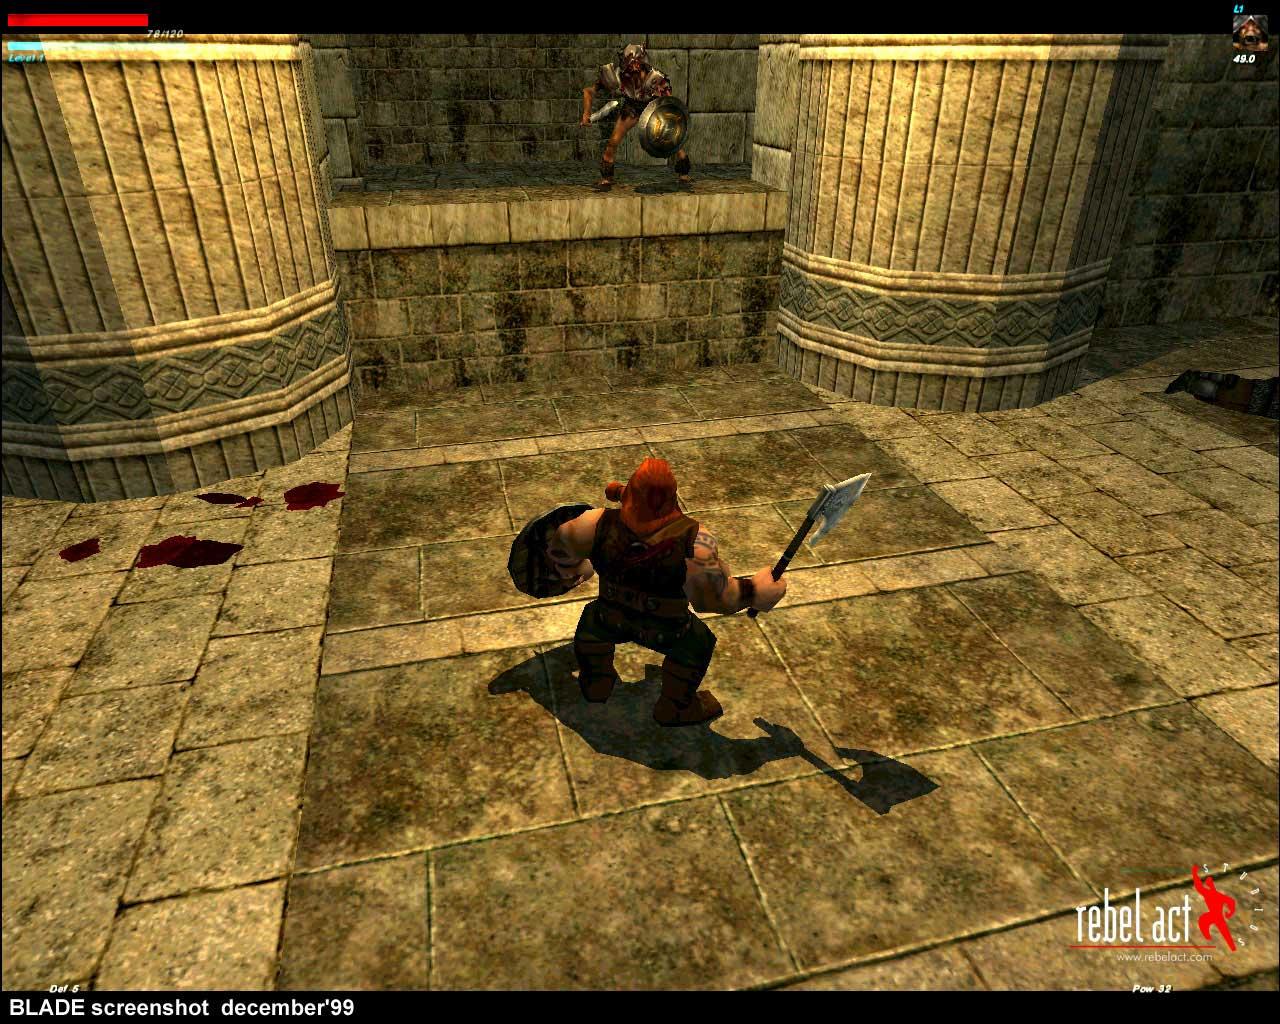 Screens Zimmer 3 angezeig: severance blade of darkness download